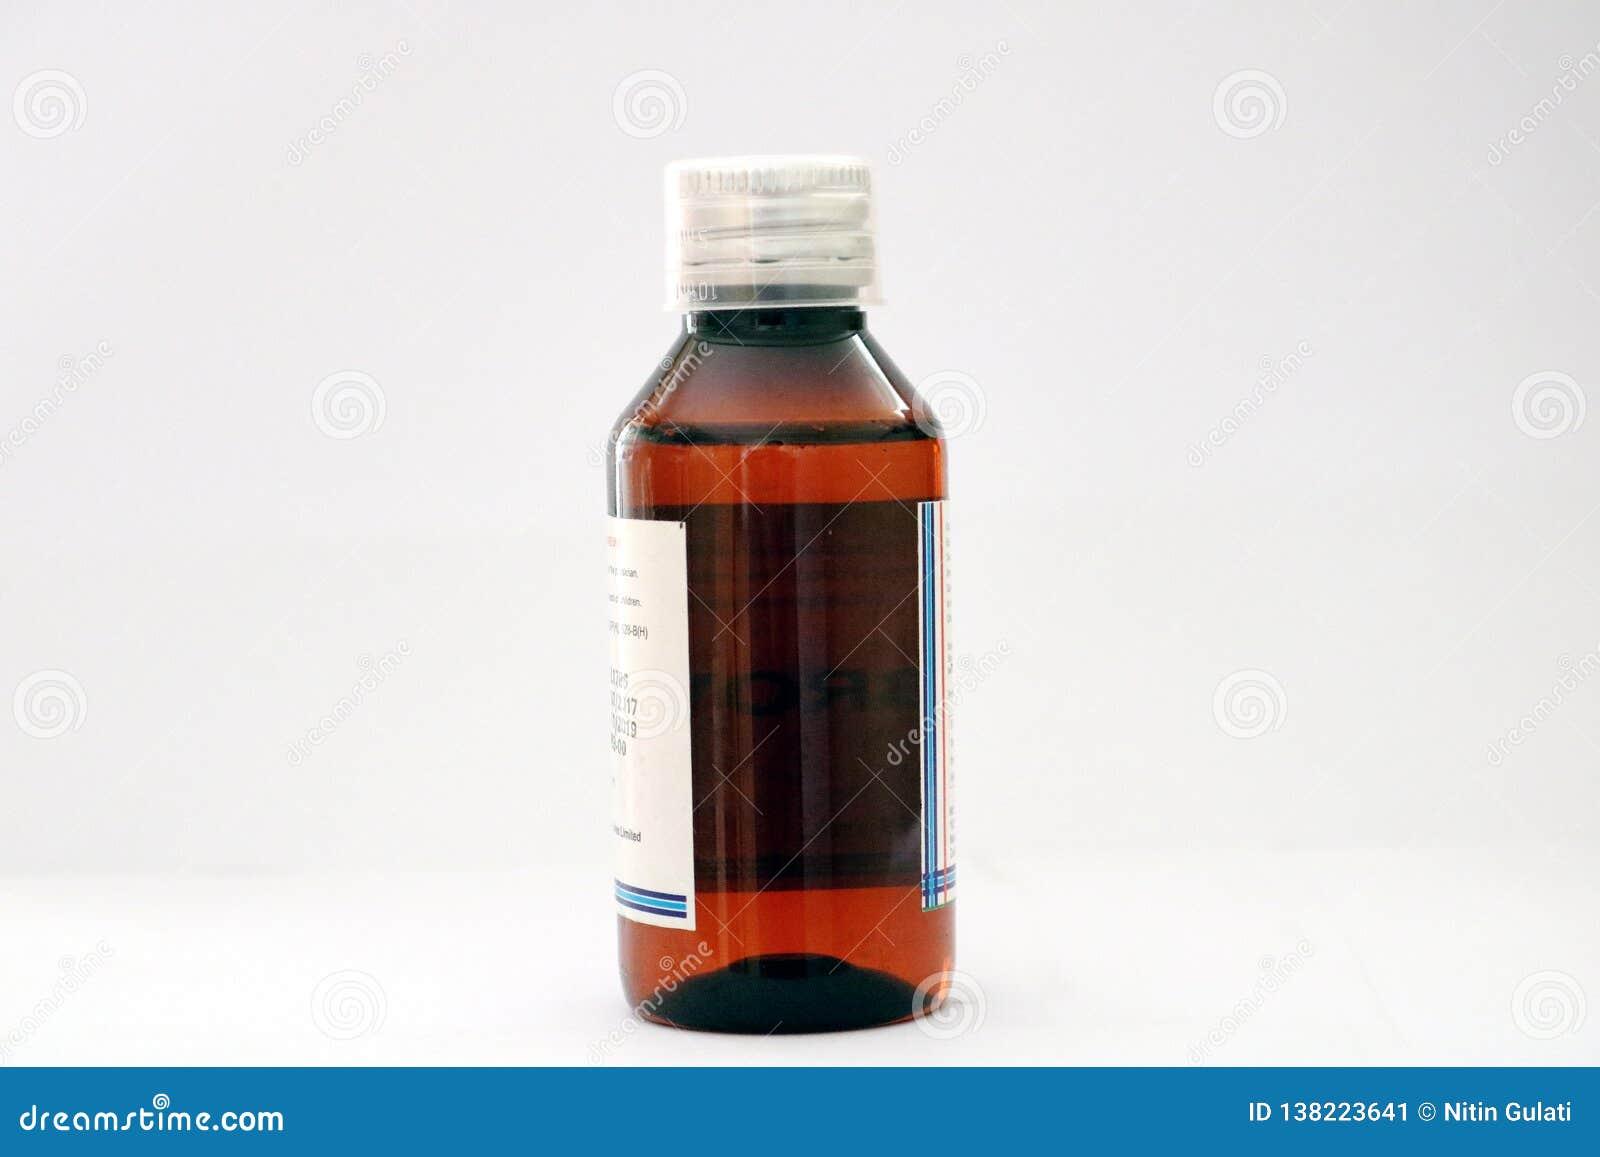 An amber colored medicine pet bottle with transparent dosage cap